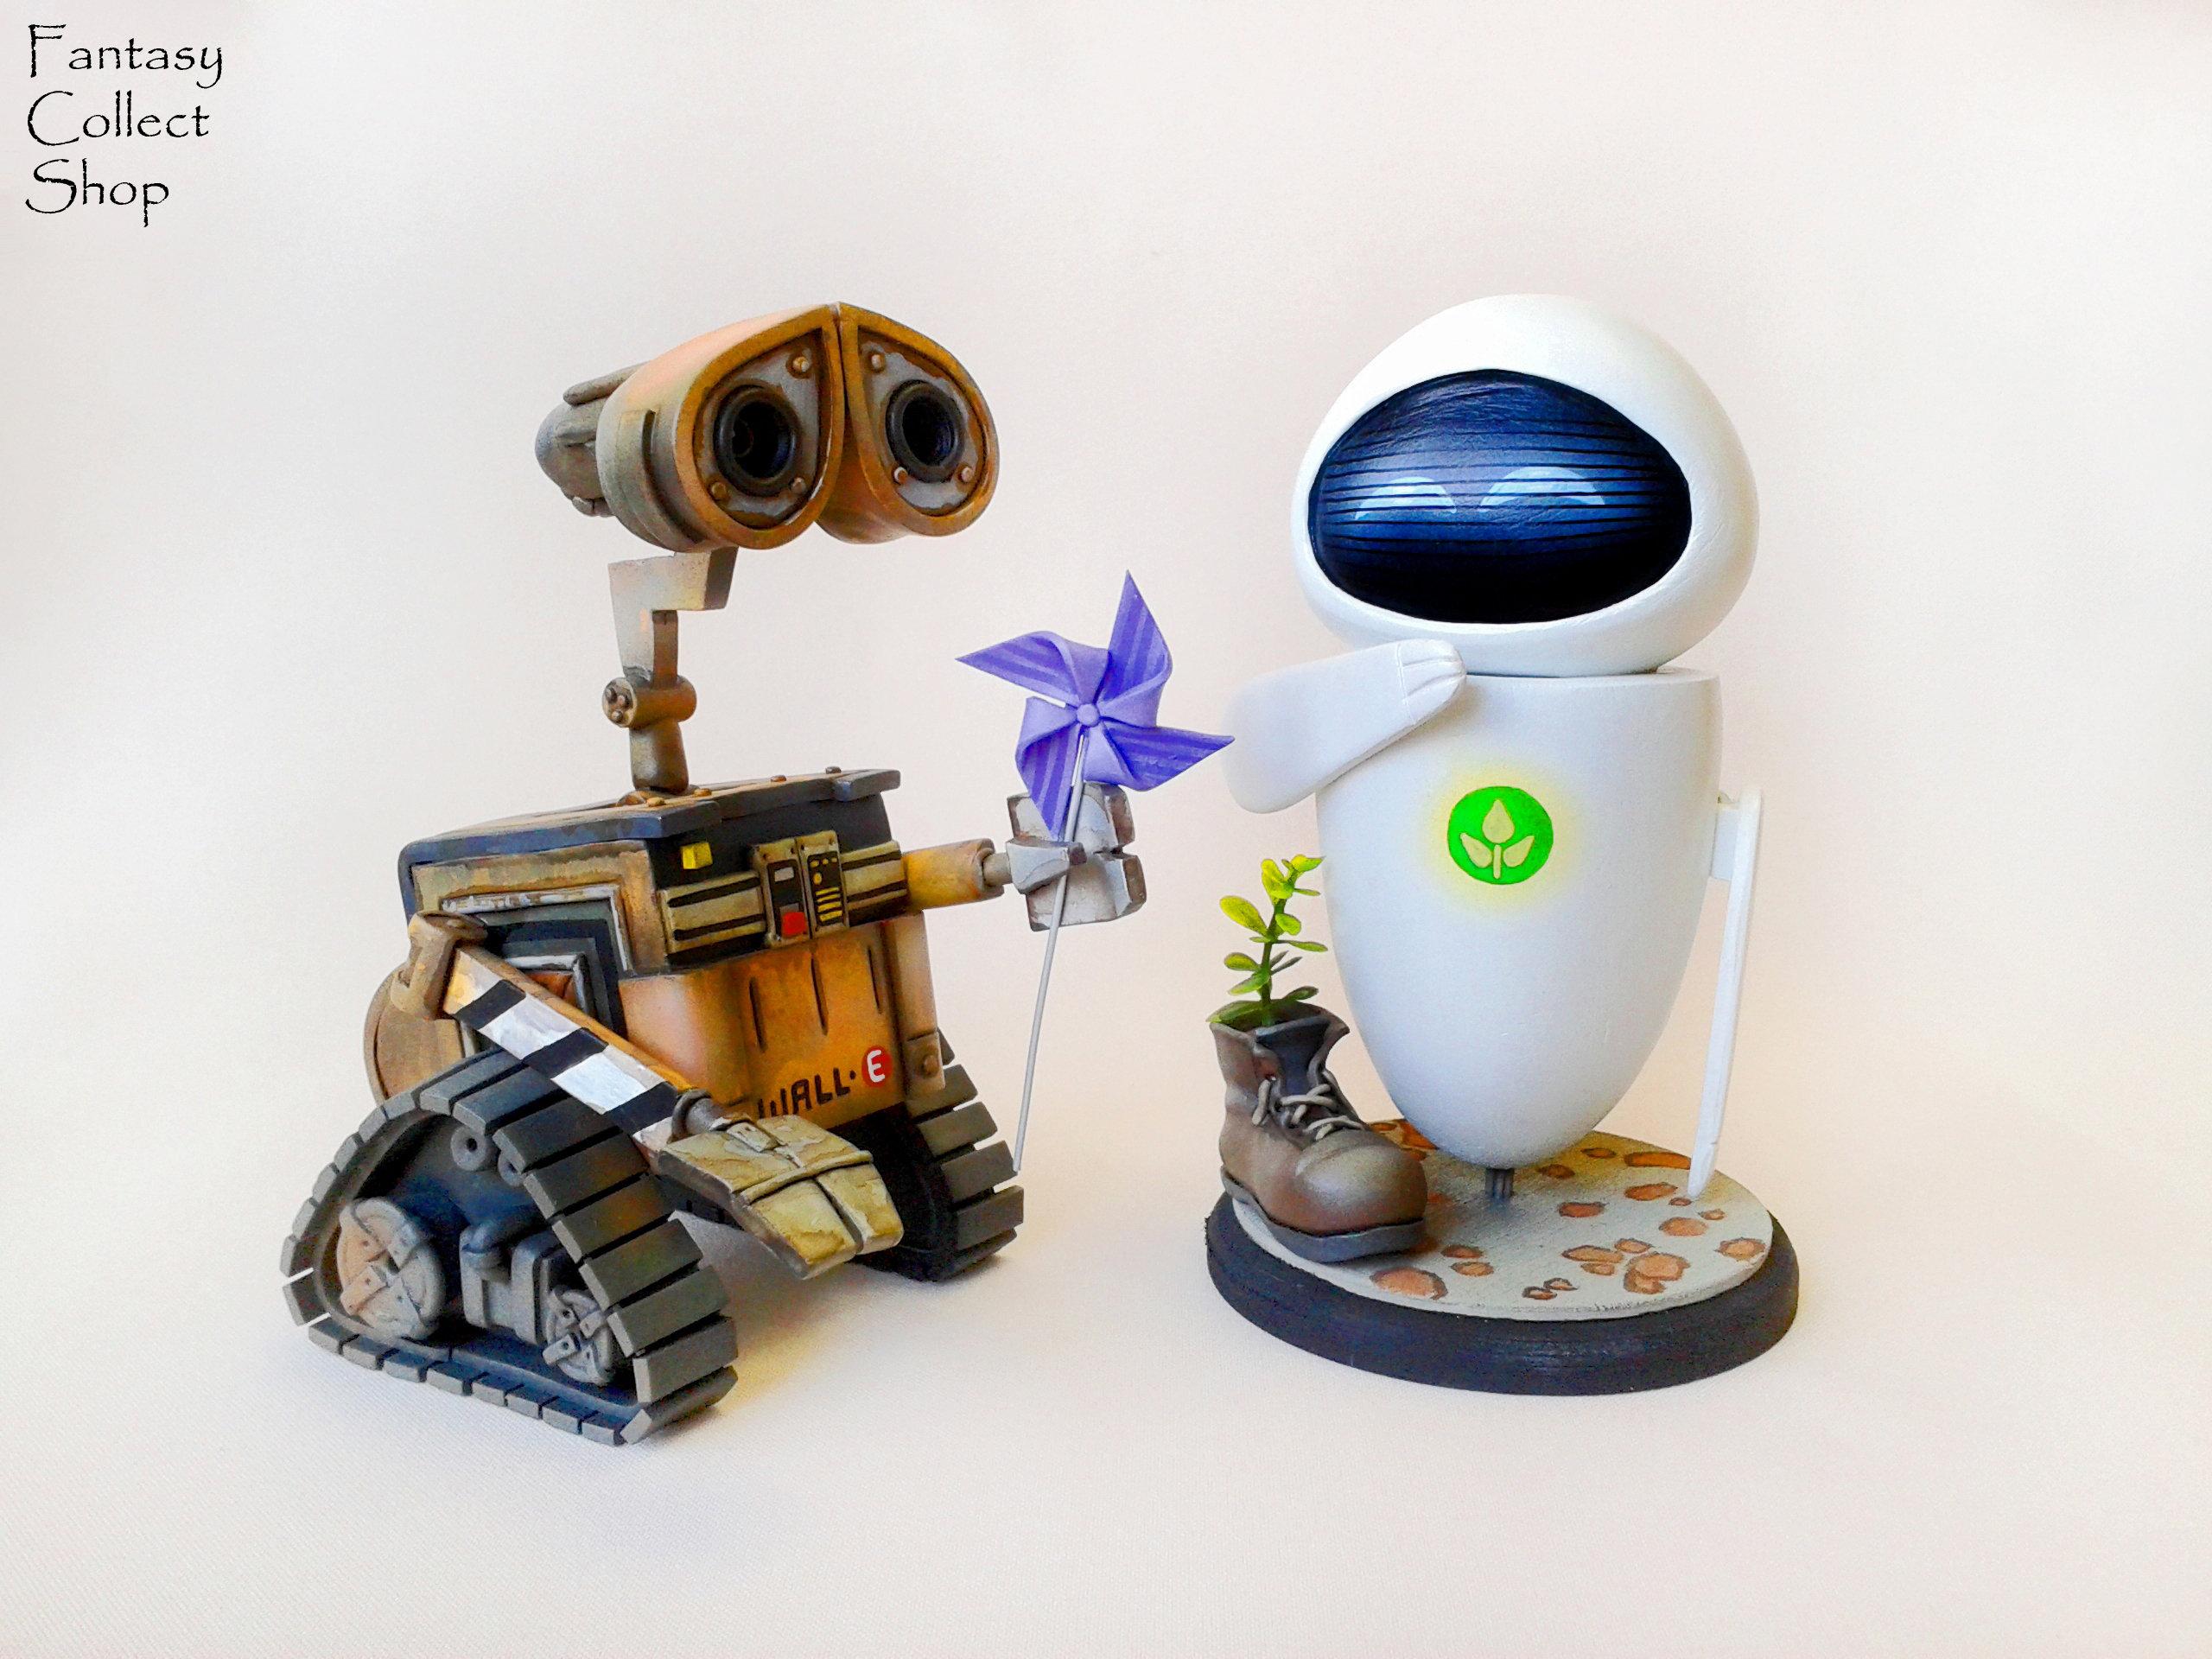 Roboter Wall-E Figur Eva Eve Figur Walle Wallie Wall-E Cartoon | Etsy